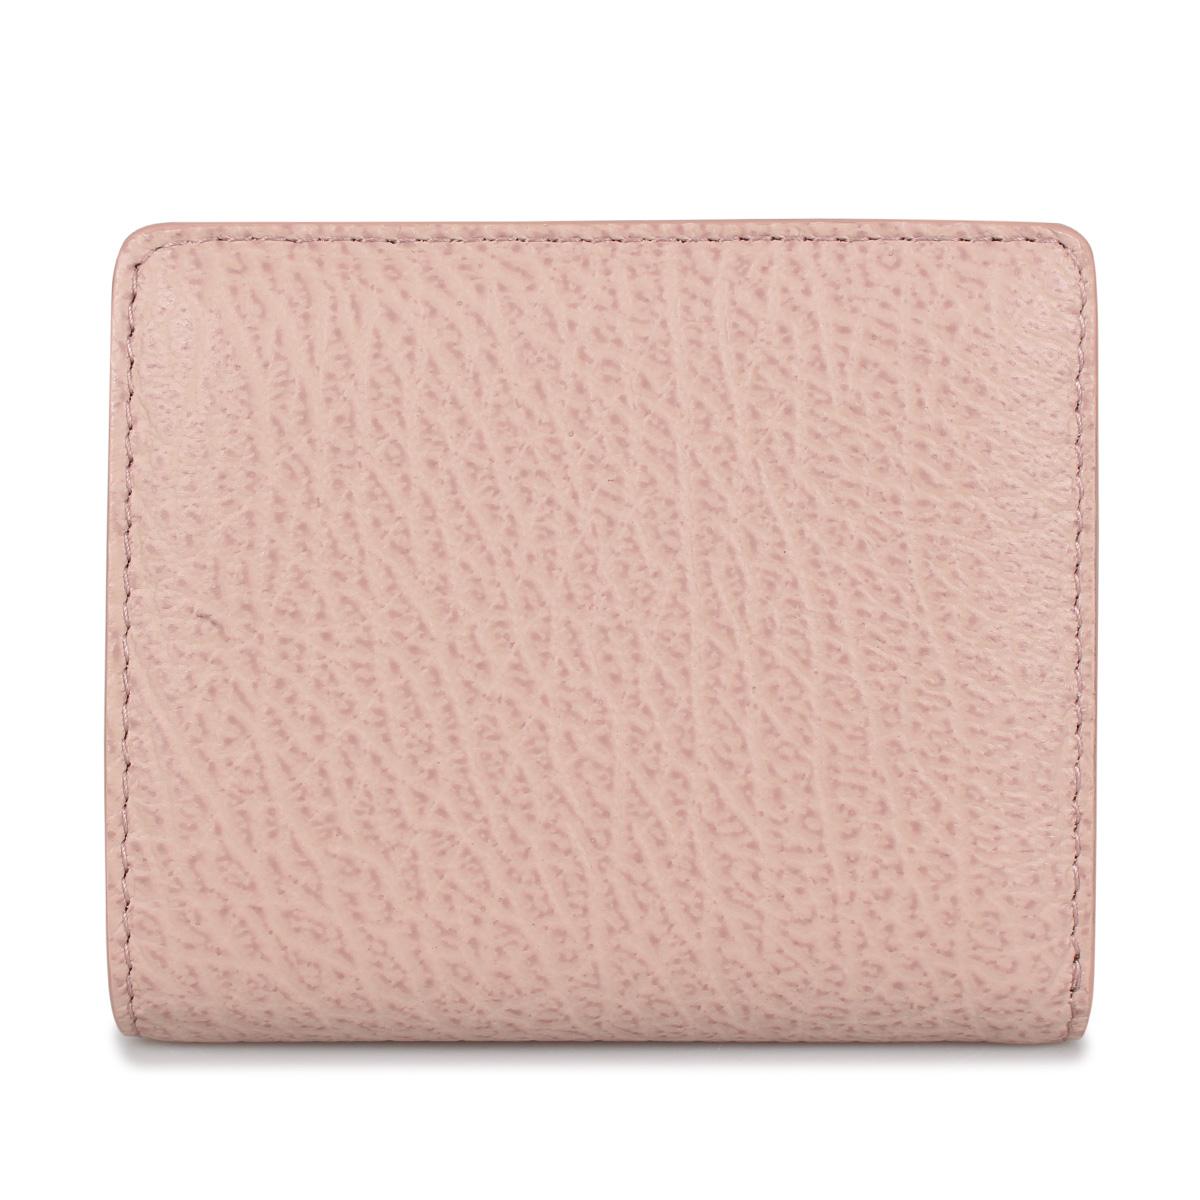 MAISON MARGIELA WALLET メゾンマルジェラ 財布 二つ折り ミニ財布 レディース ピンク S56UI0140 [4/15 新入荷]